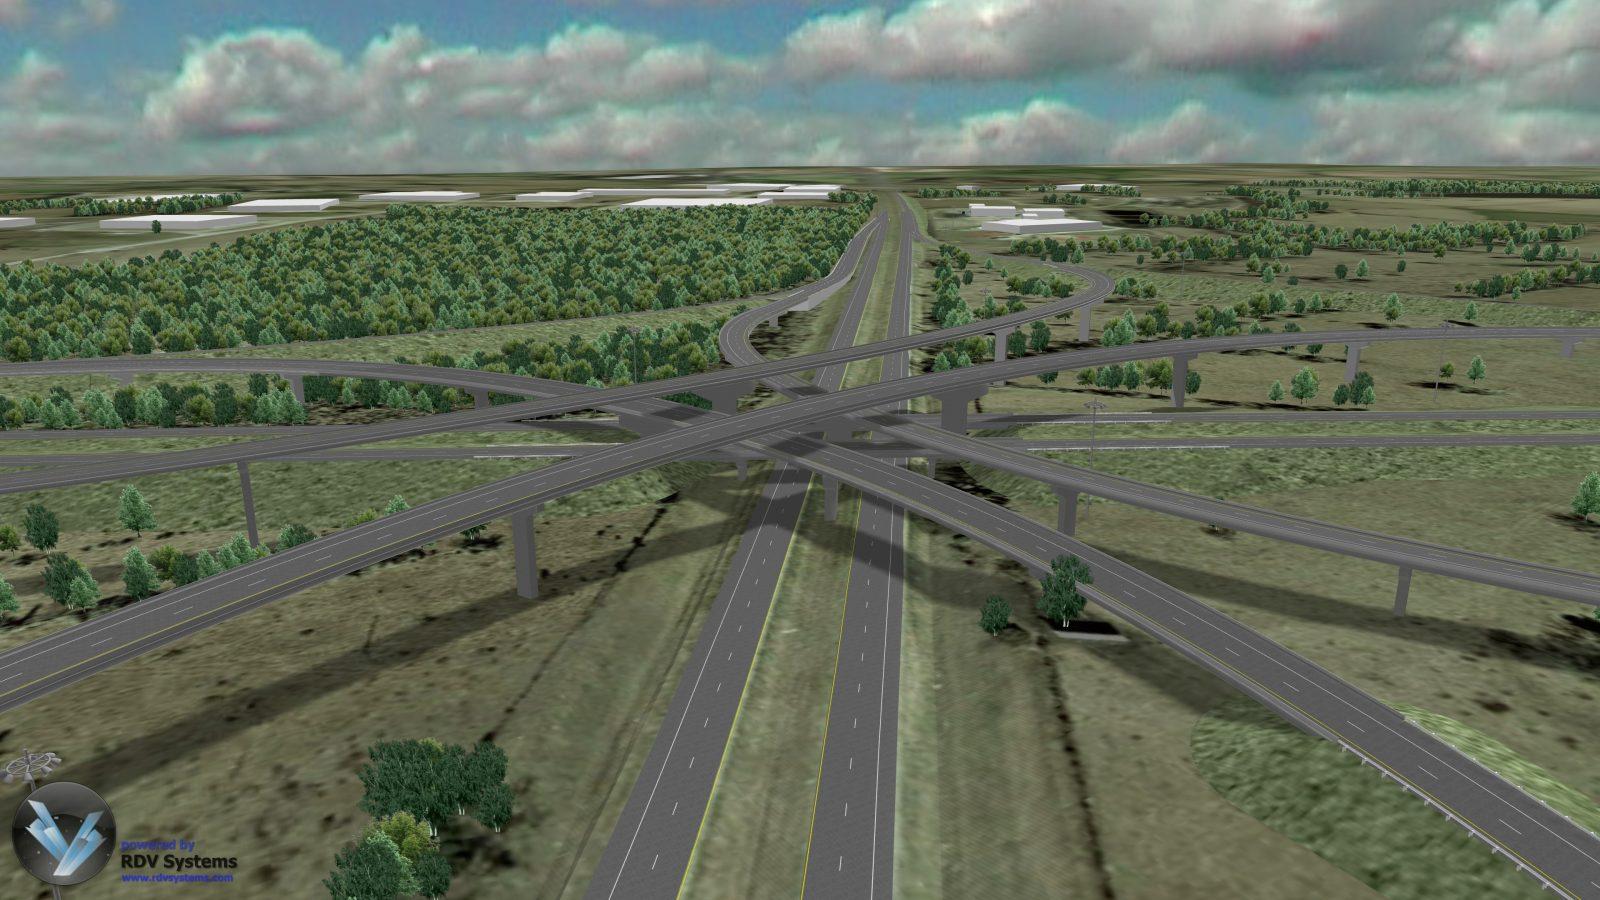 RDV Systems - I-65 Interchange 1